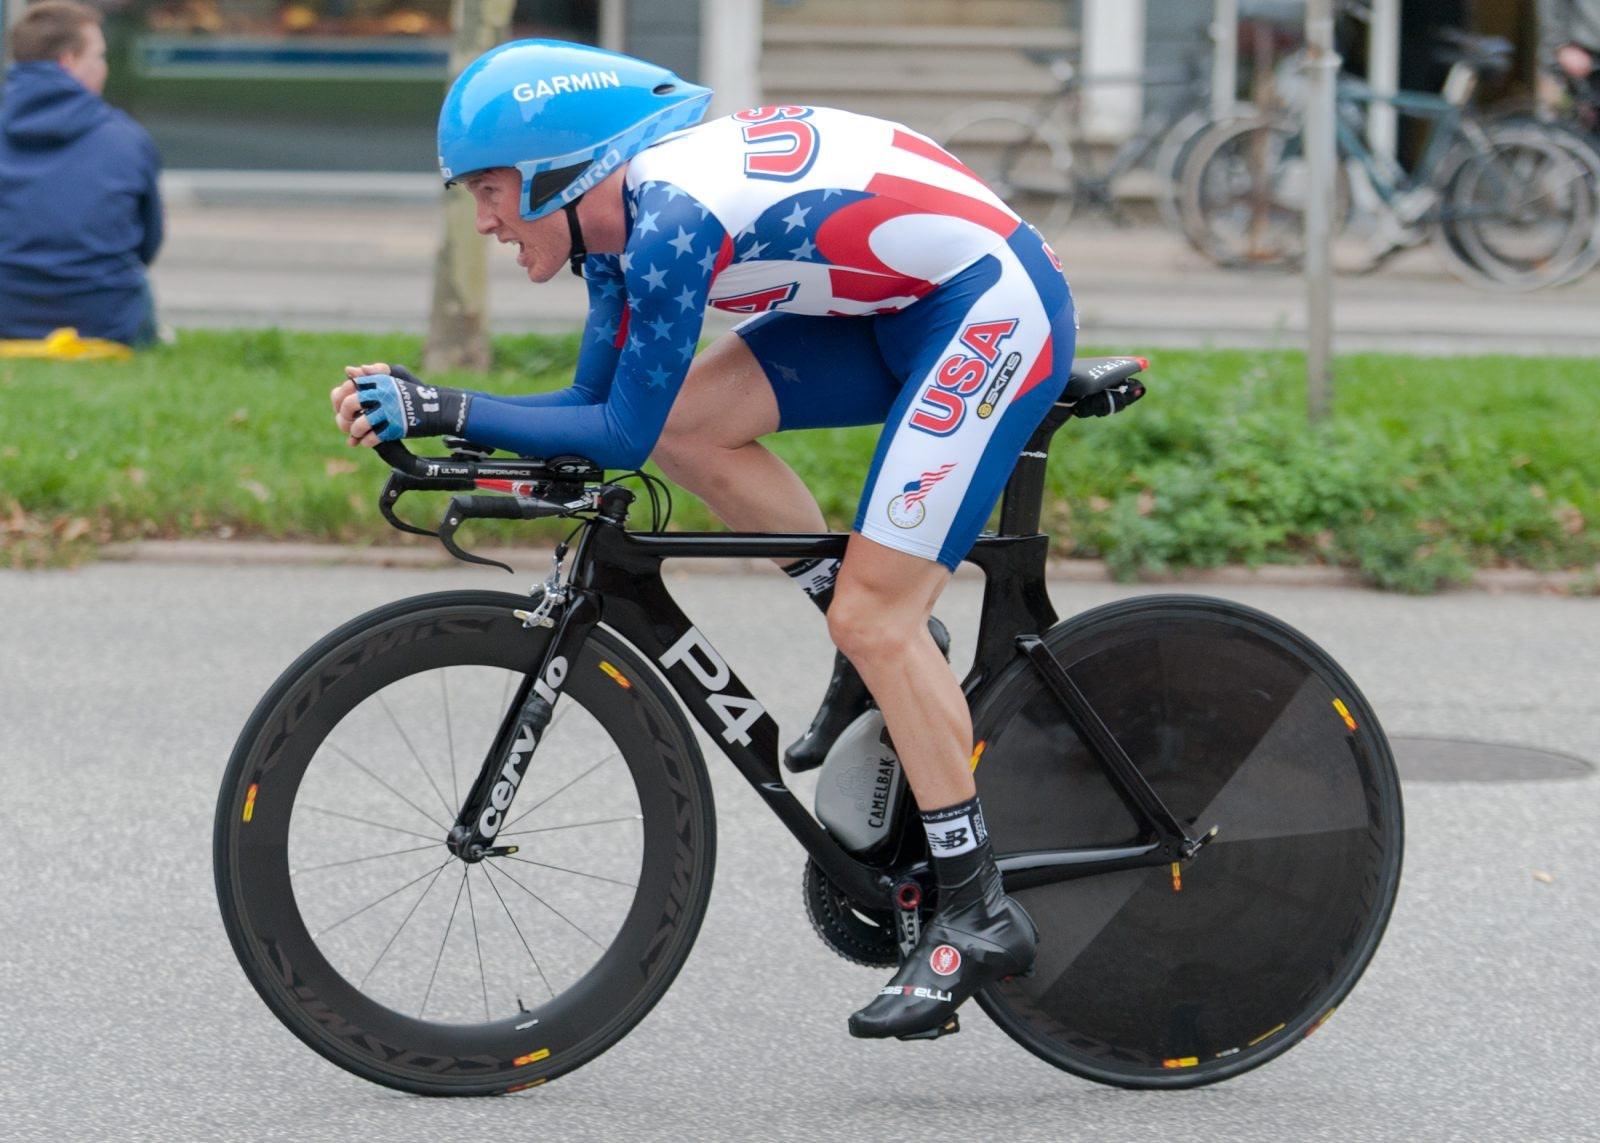 American professional triathlete Andrew Talansky